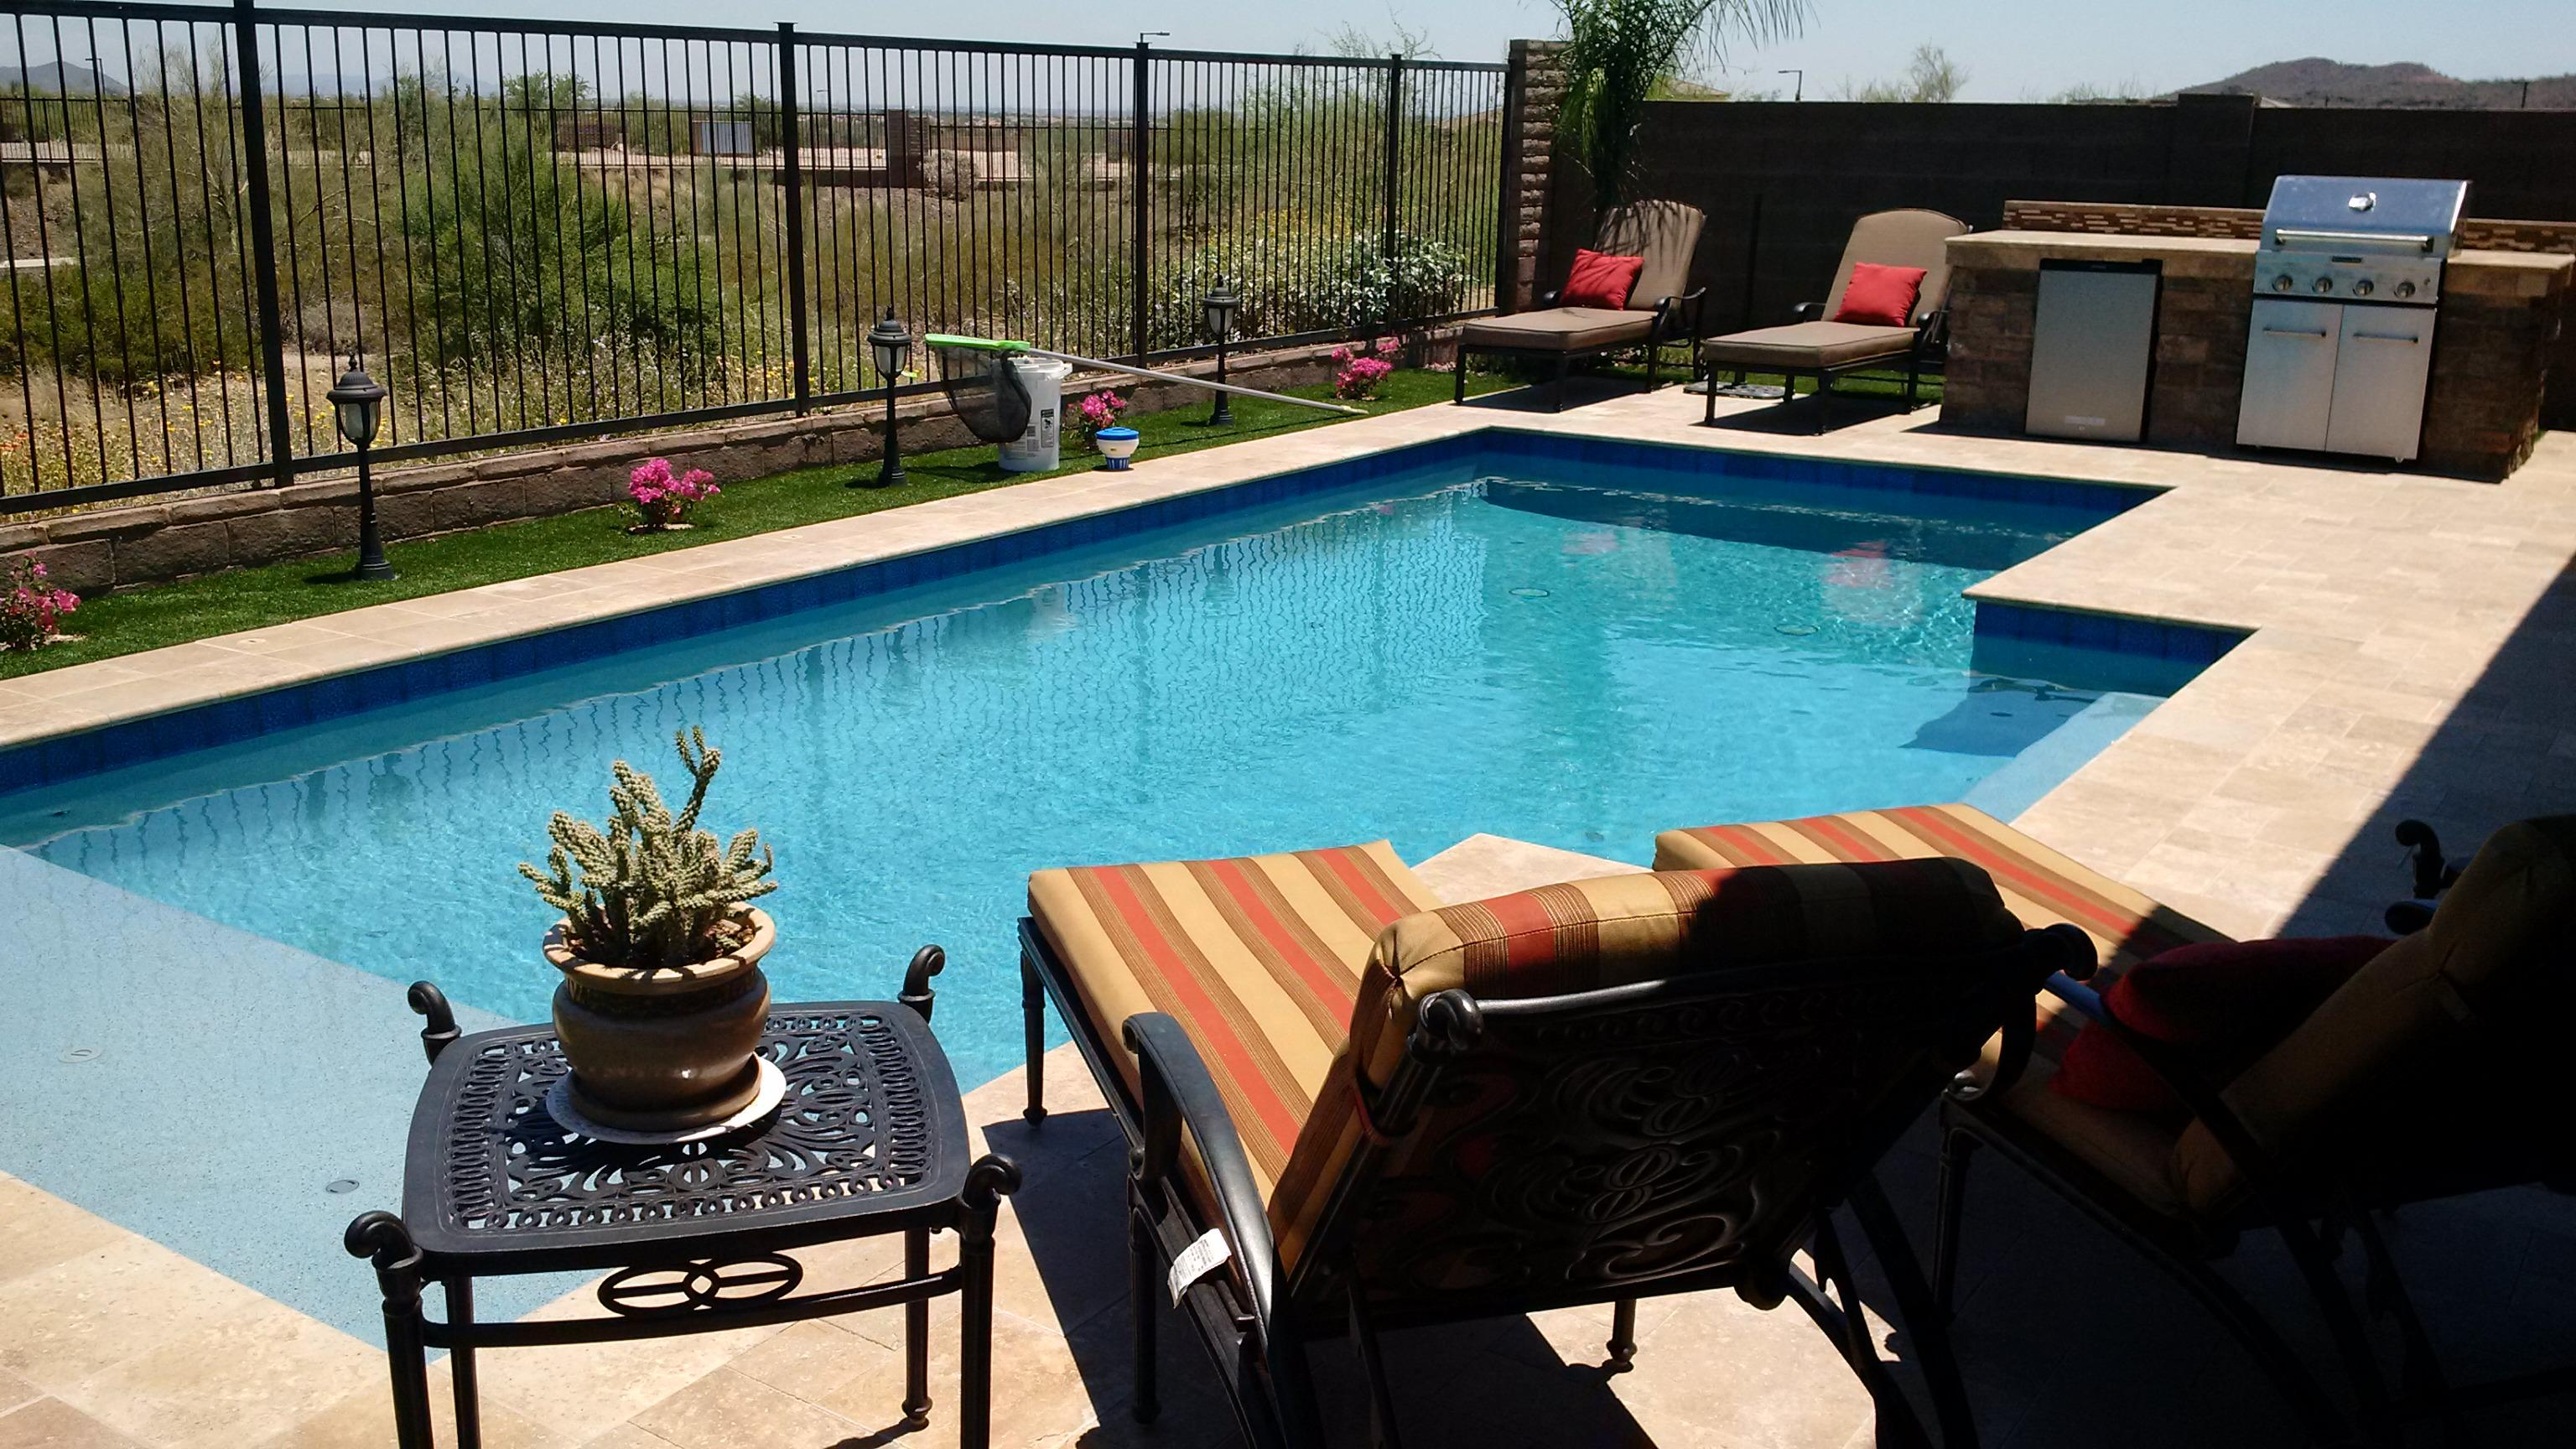 Keywize Pool Professionals, LLC